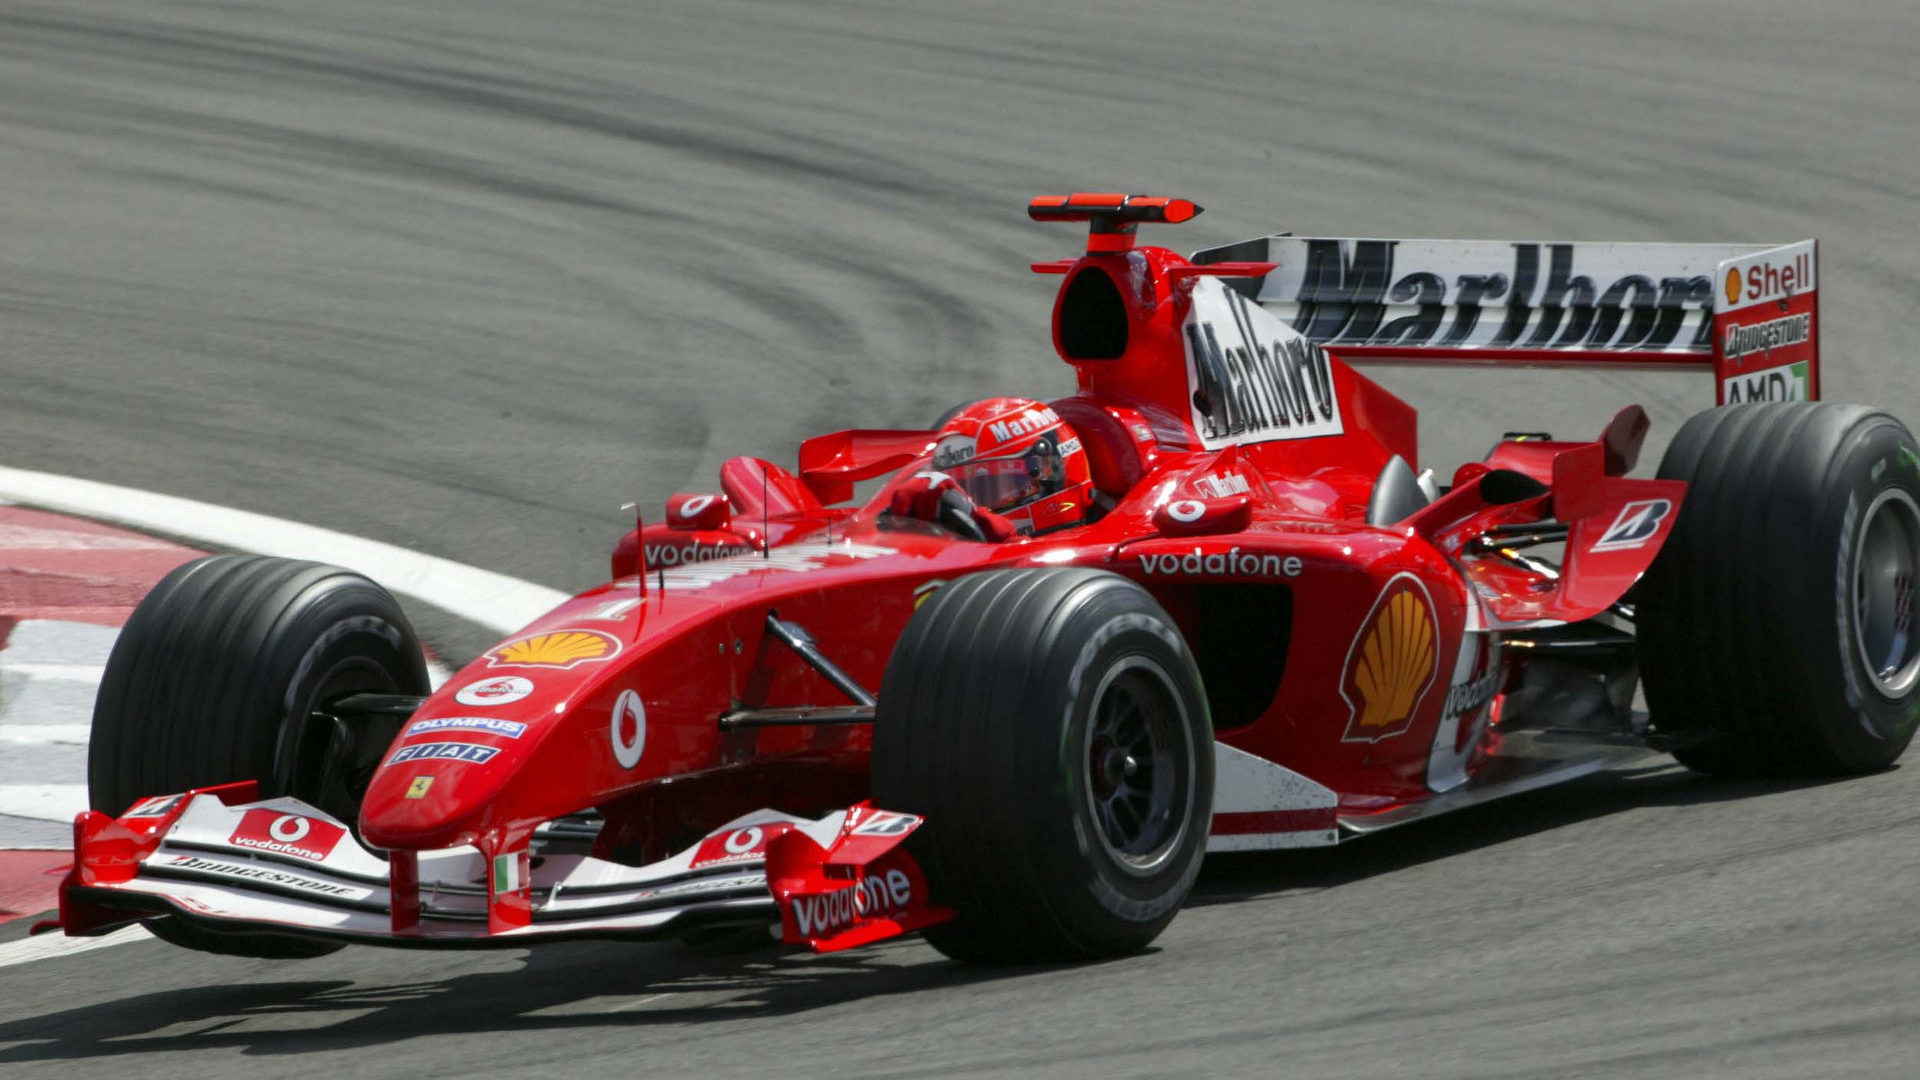 F1-Fansite.com%2B2004%2BHD%2Bwallpaper%2BF1%2BGP%2BEurope_05.jpg